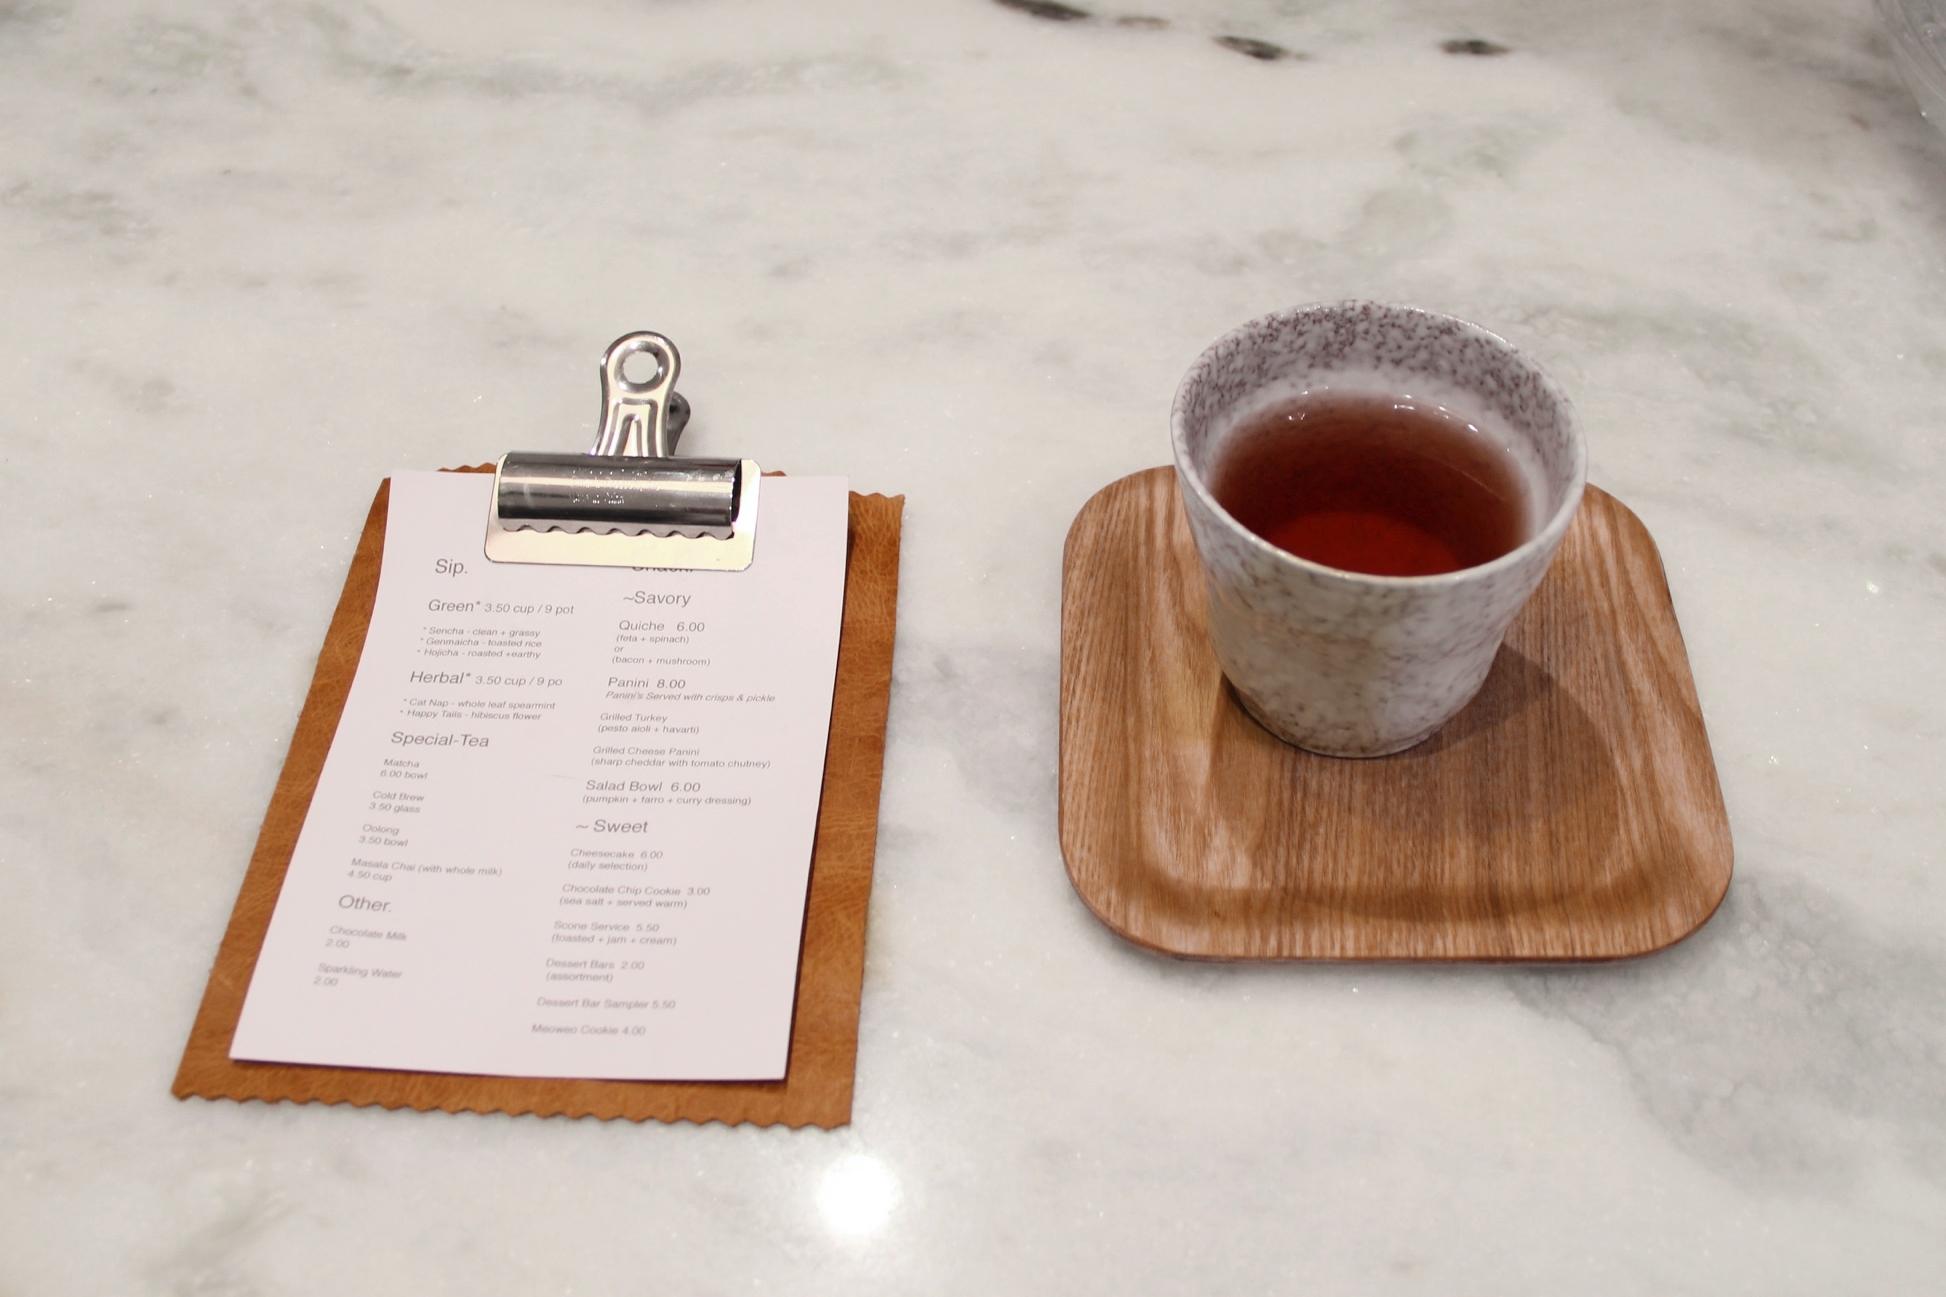 Kit Tea menu